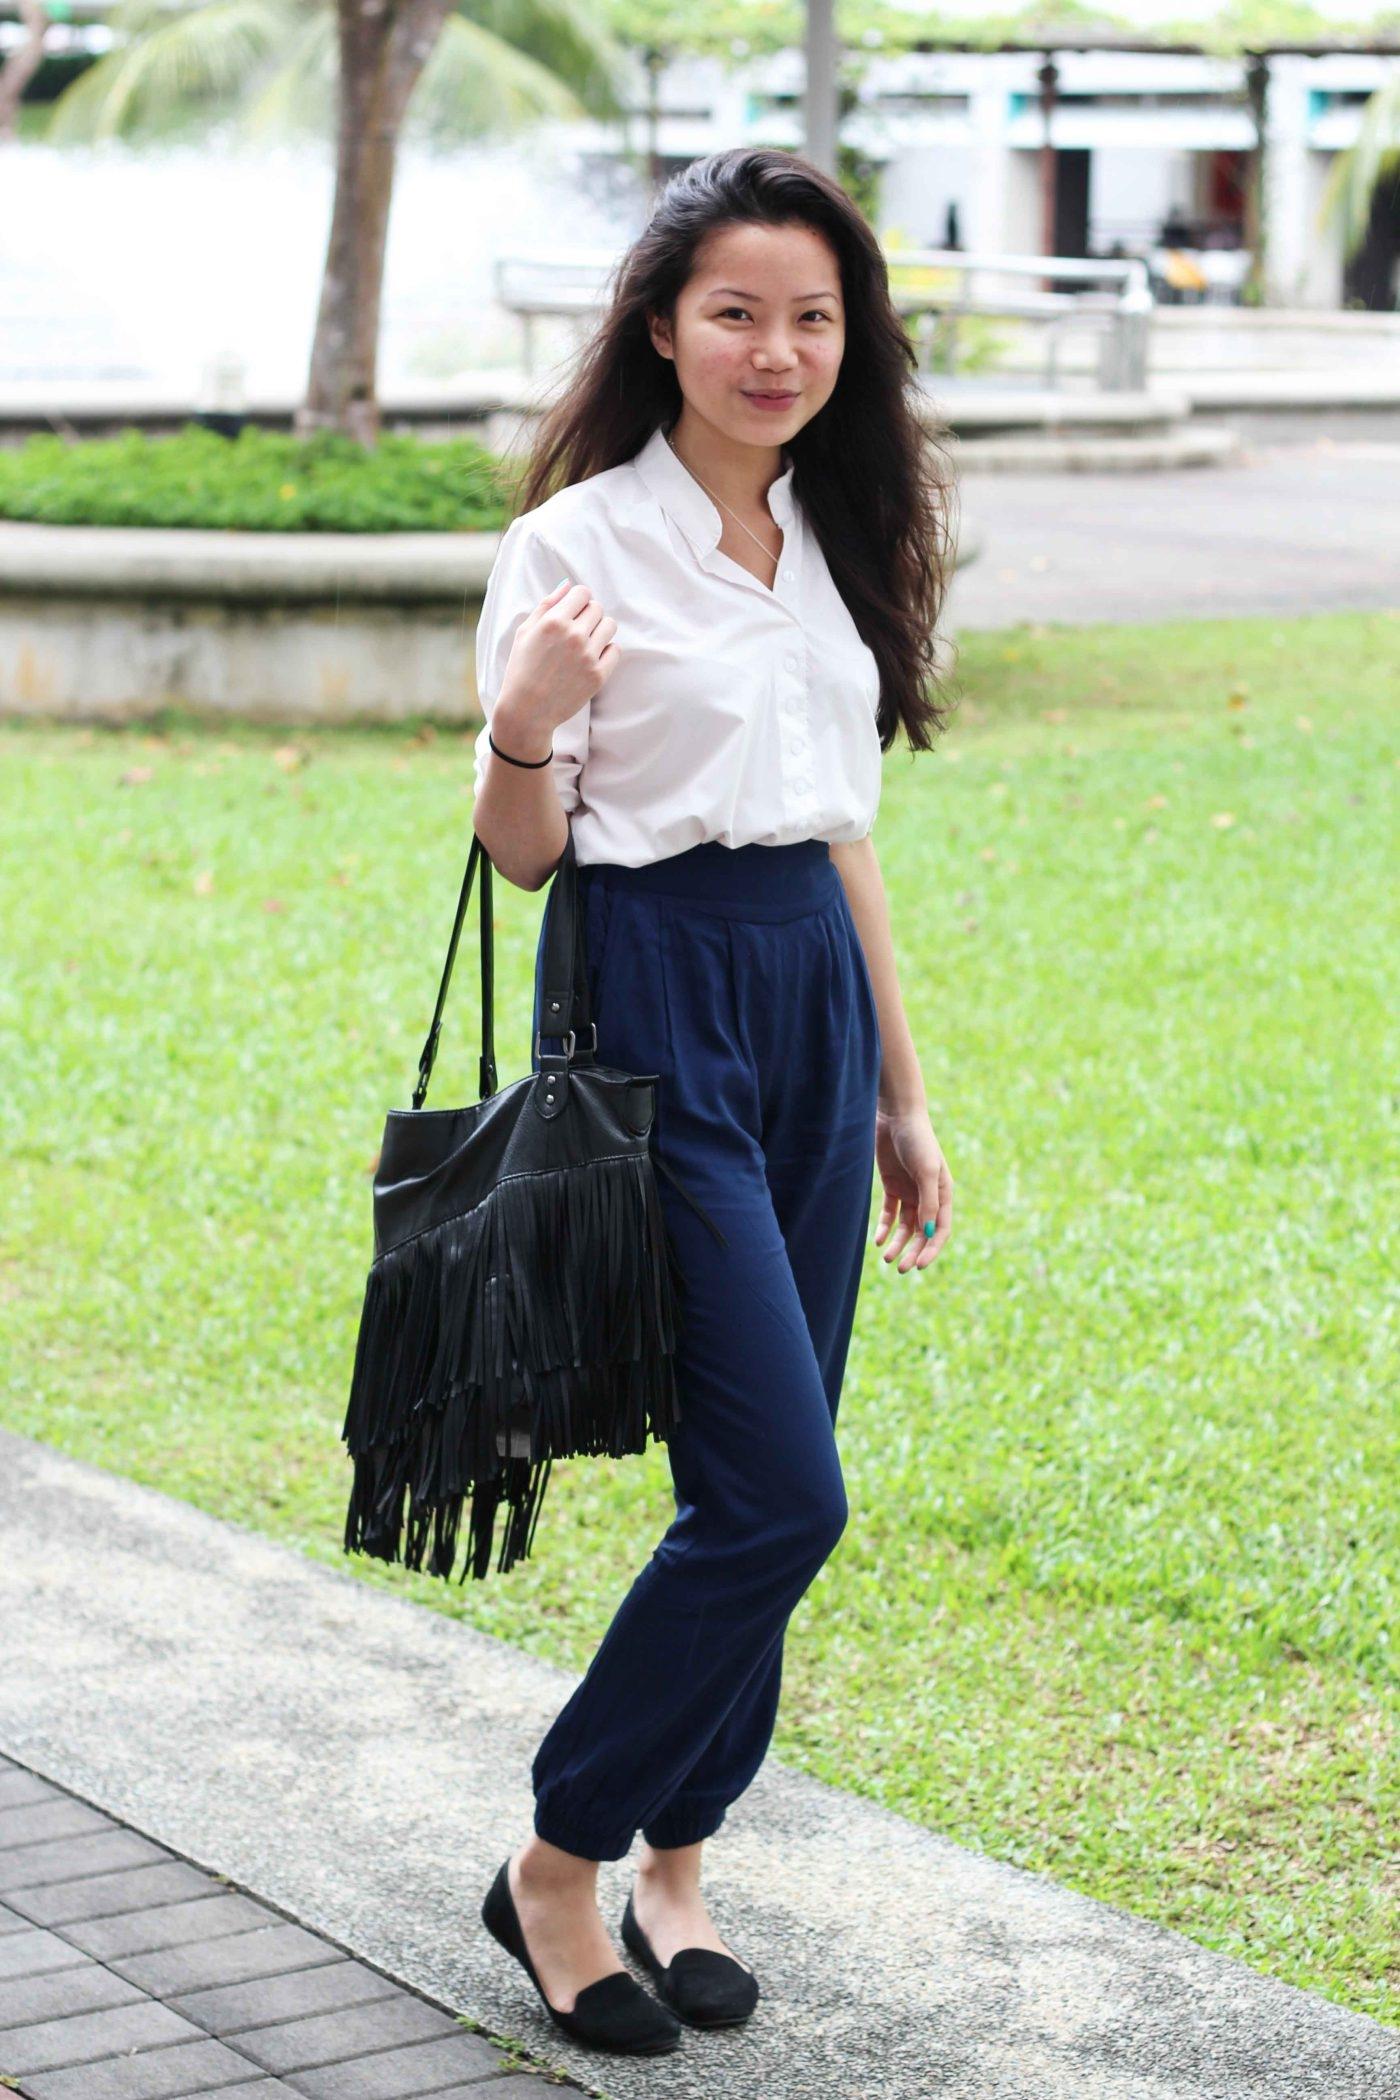 Nanyang Technical University  White Mandarin Collar Shirt  Blue High-Waisted Pants  Black Slippers  Black Tassel Purse